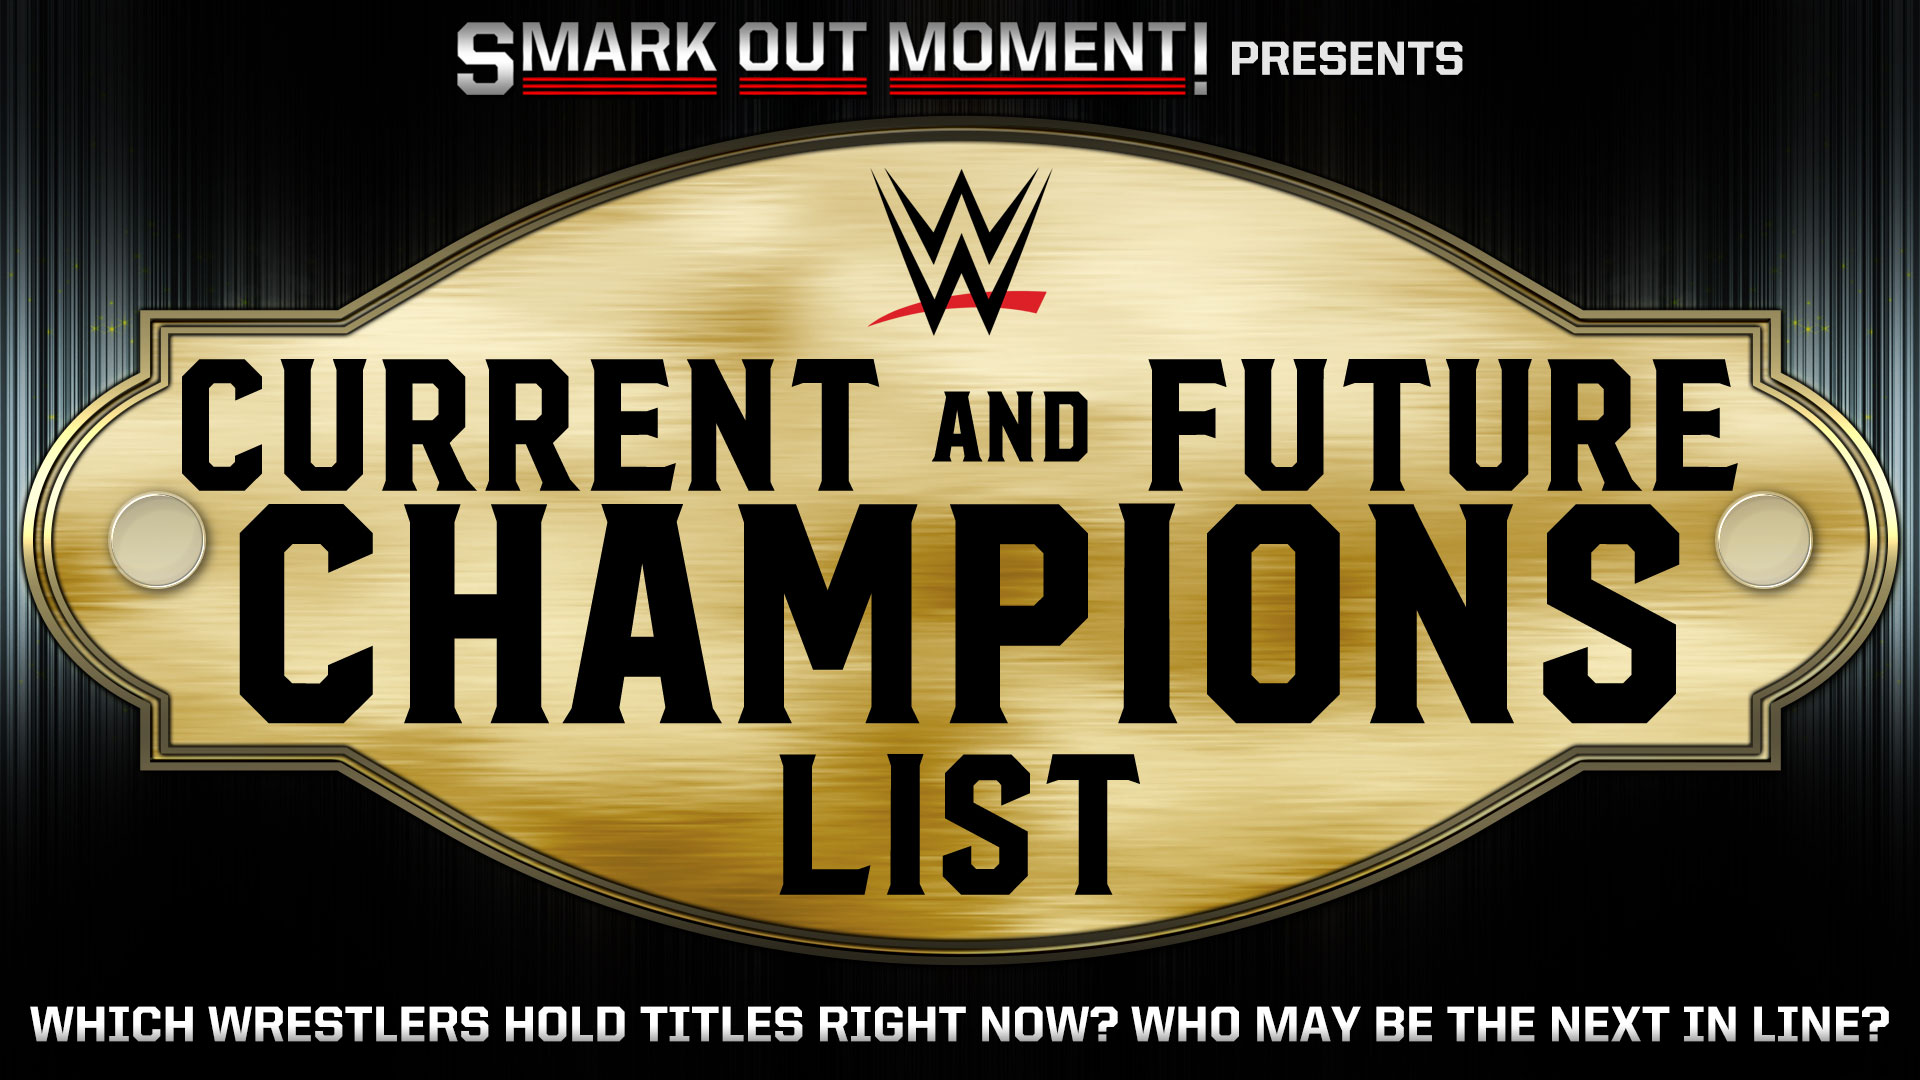 current WWE x champion title holder